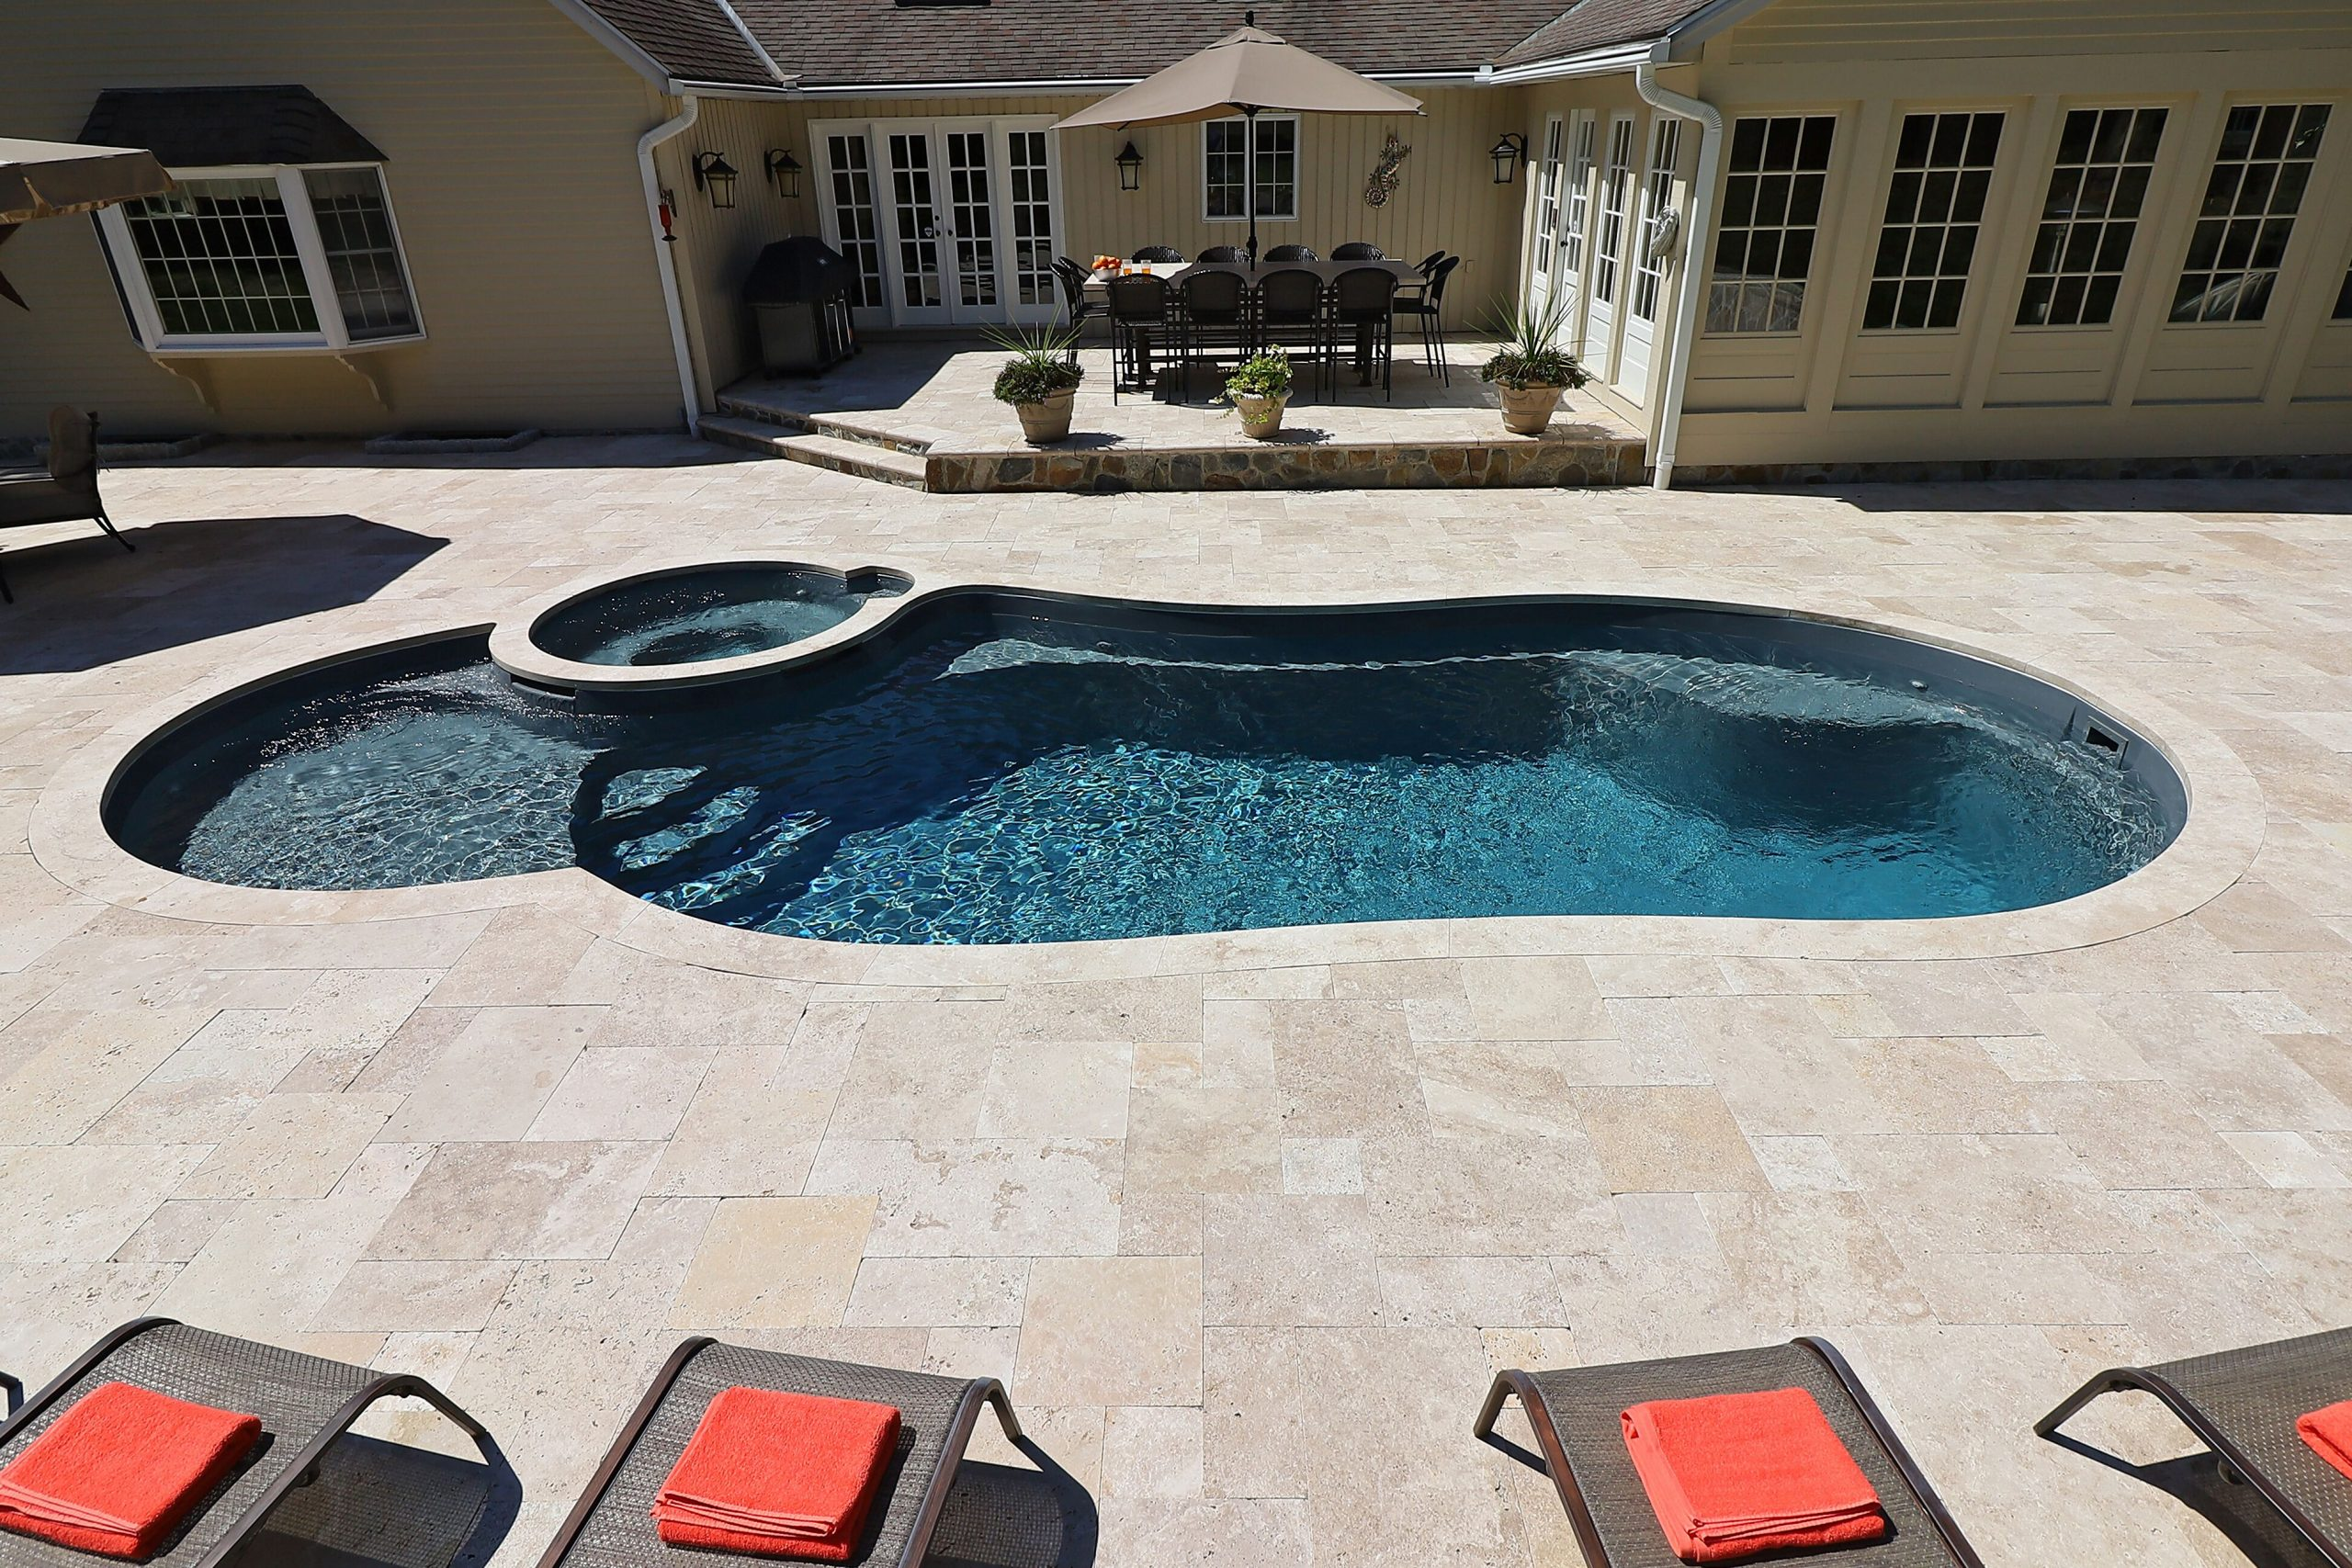 Leisure Pools Allure 30 Graphite Grey 2019 0830 1 scaled